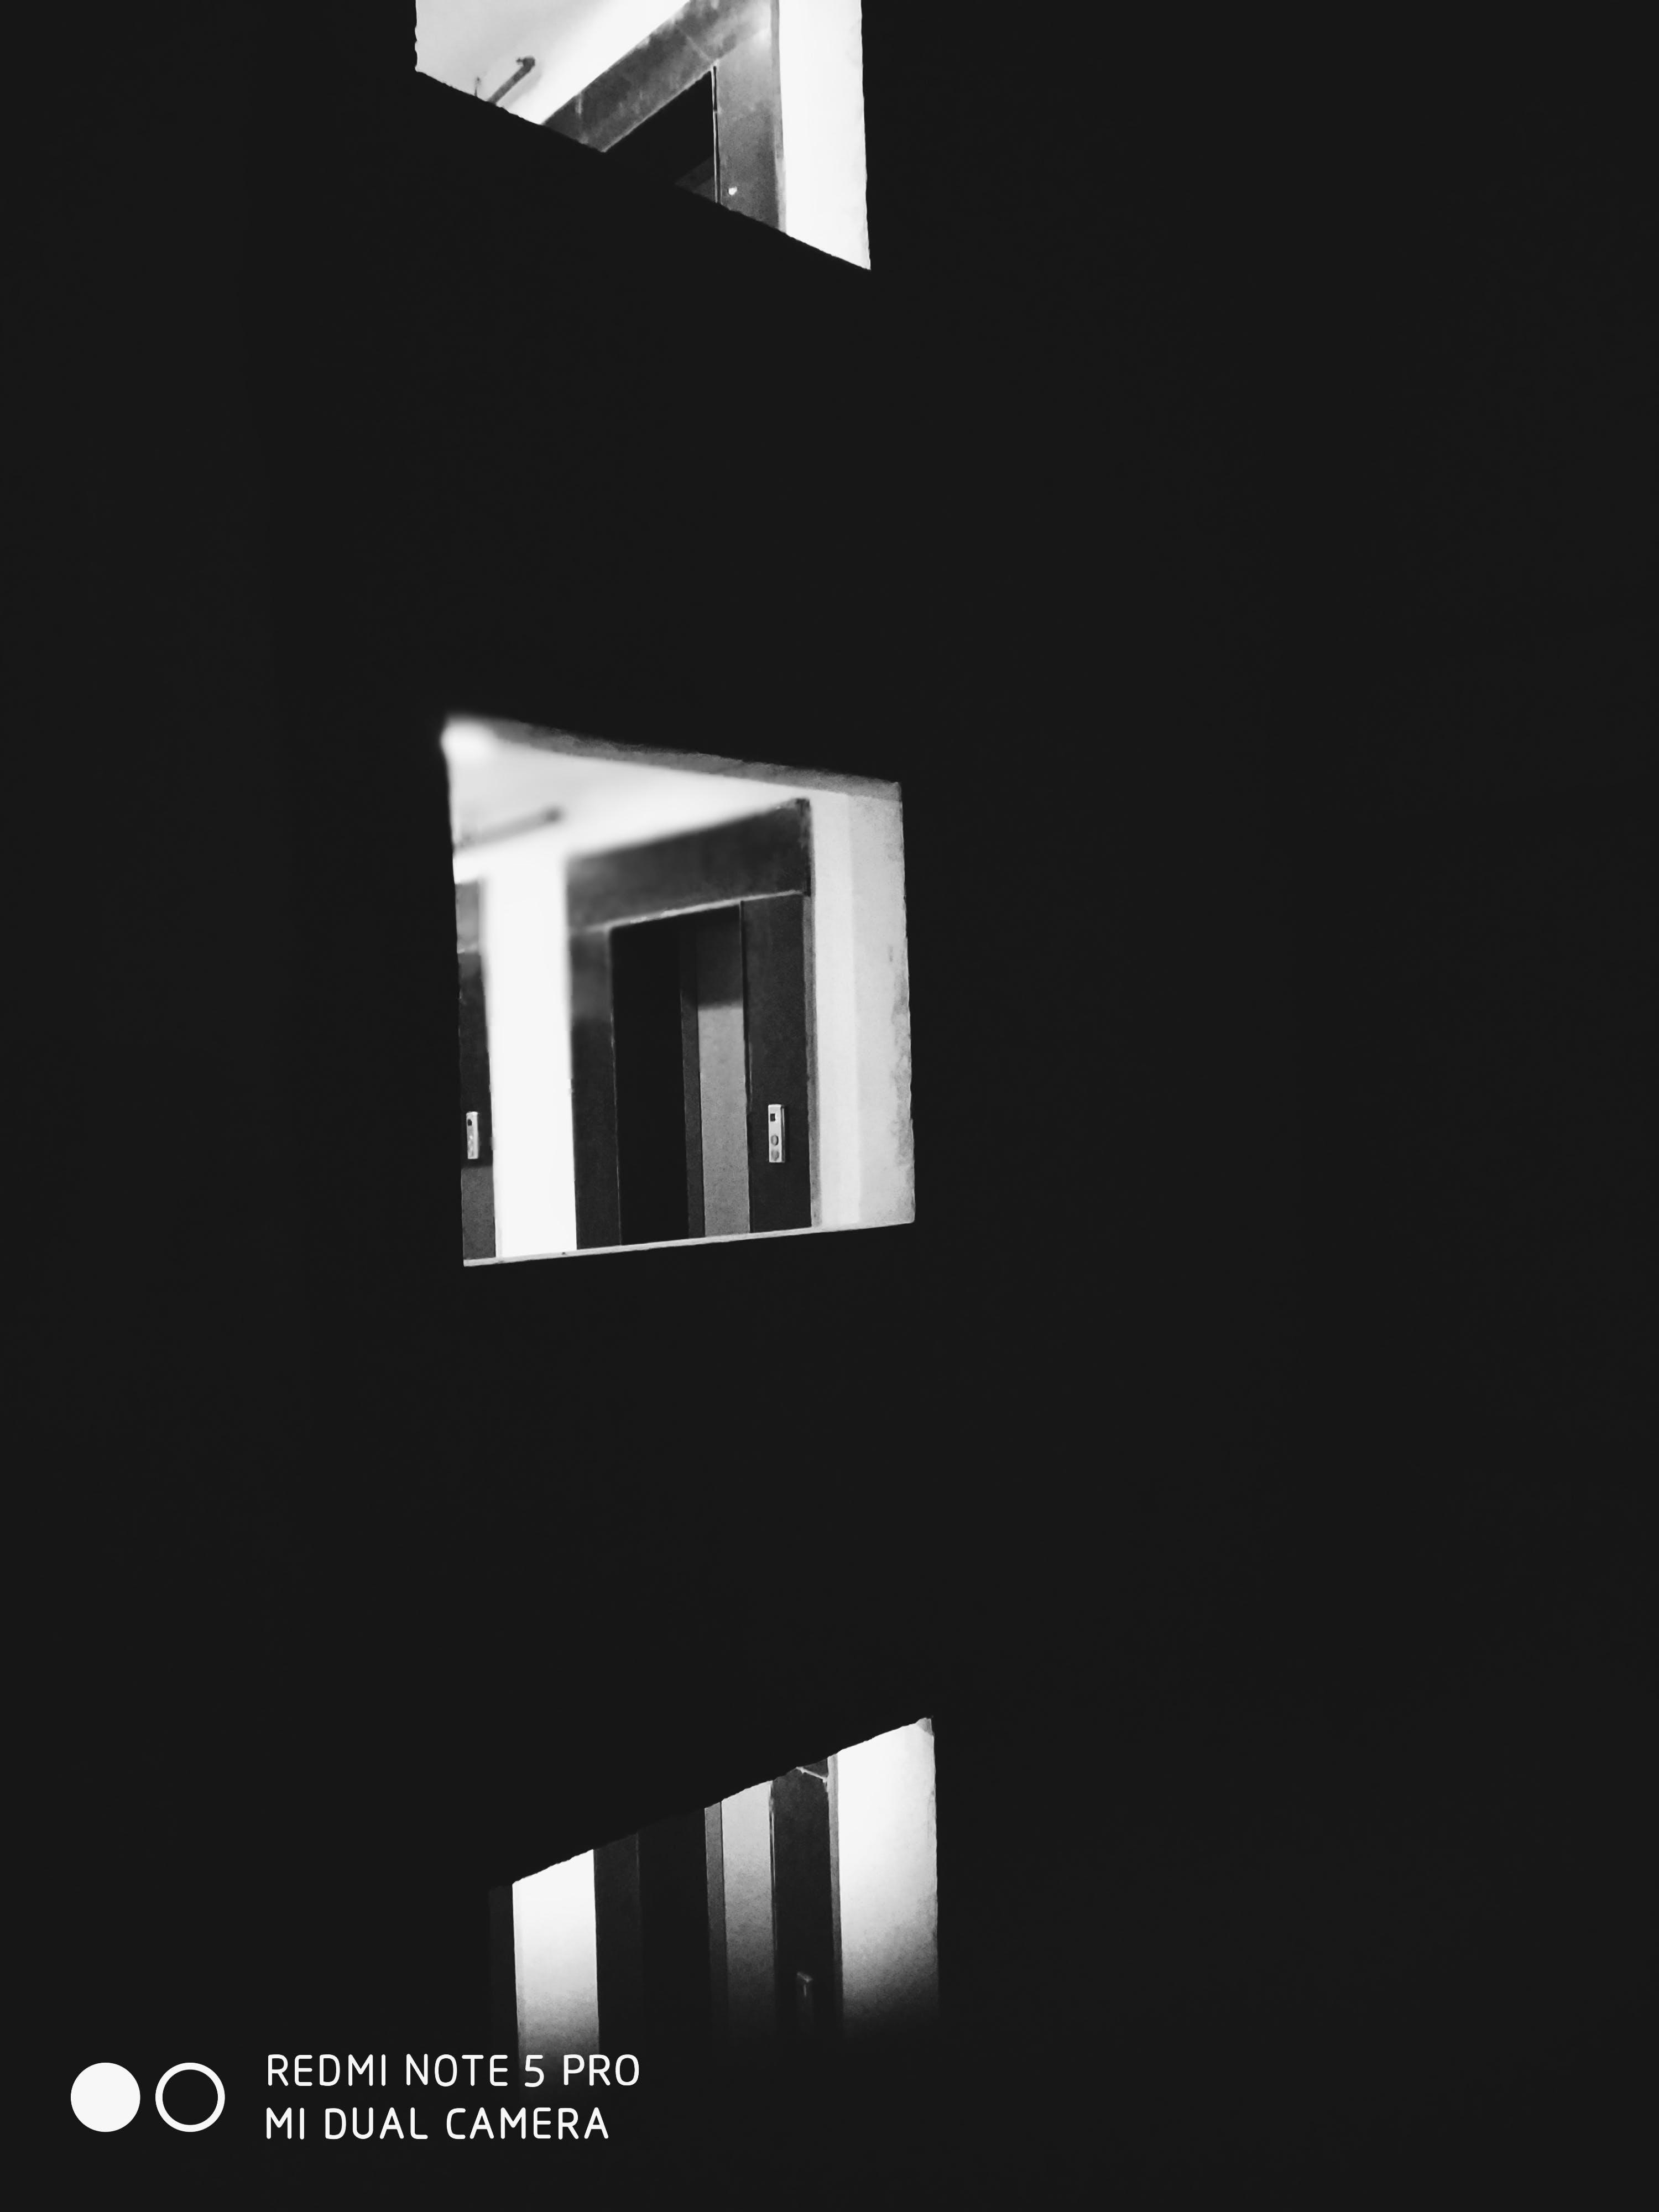 Free stock photo of #architecture, #blackandwhite, #bnw, #building